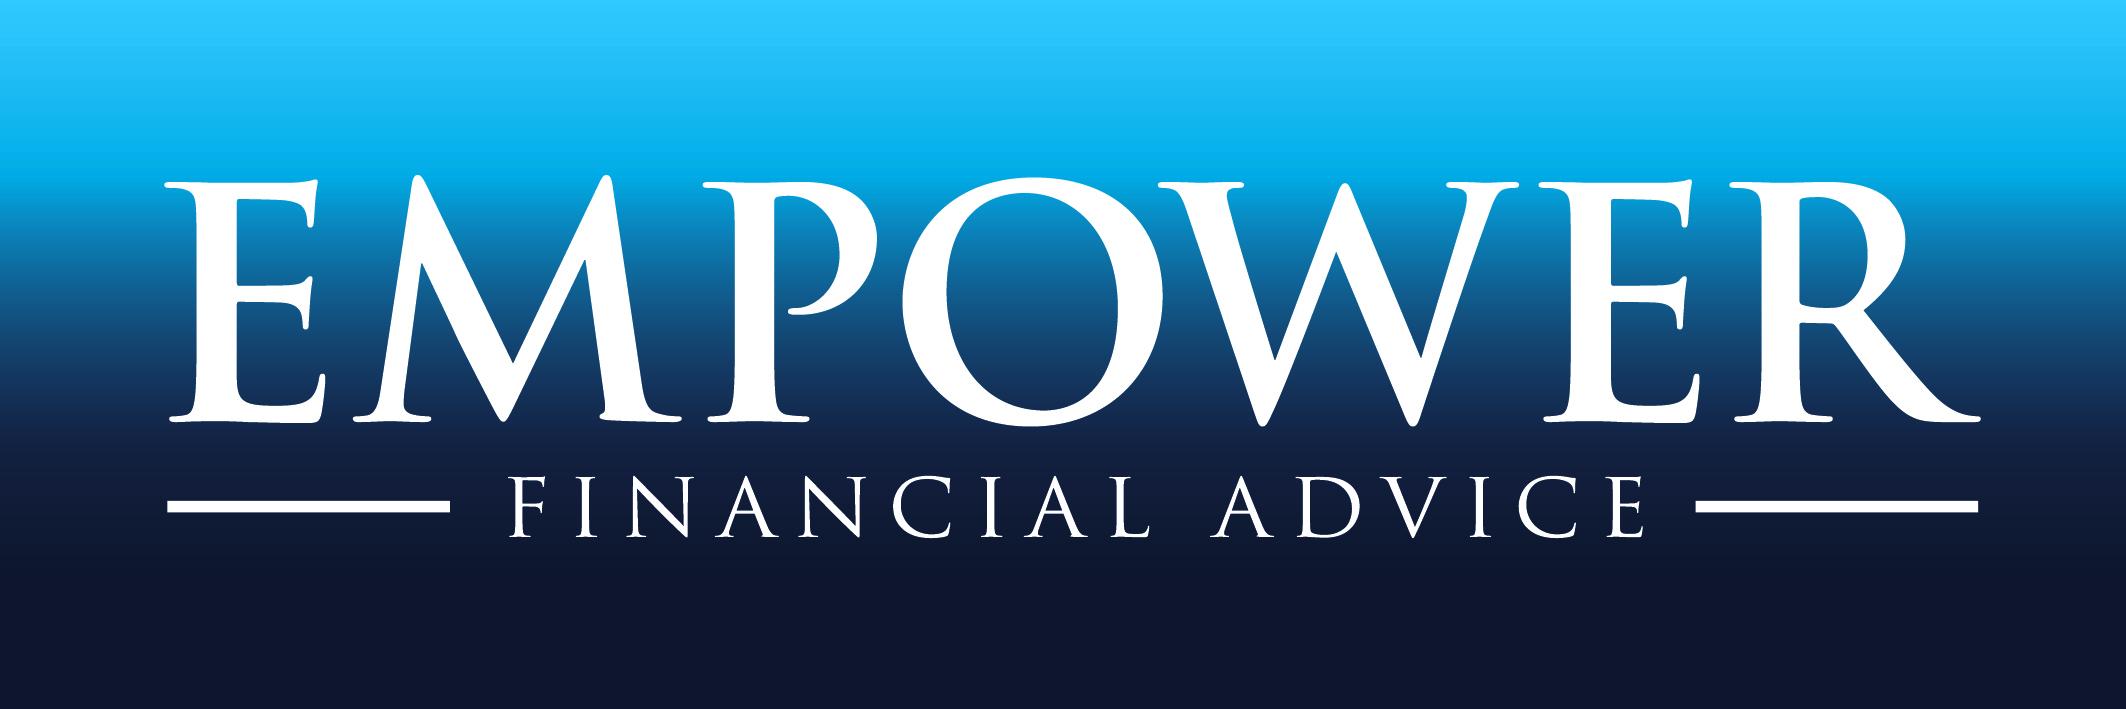 empower-financial-advice